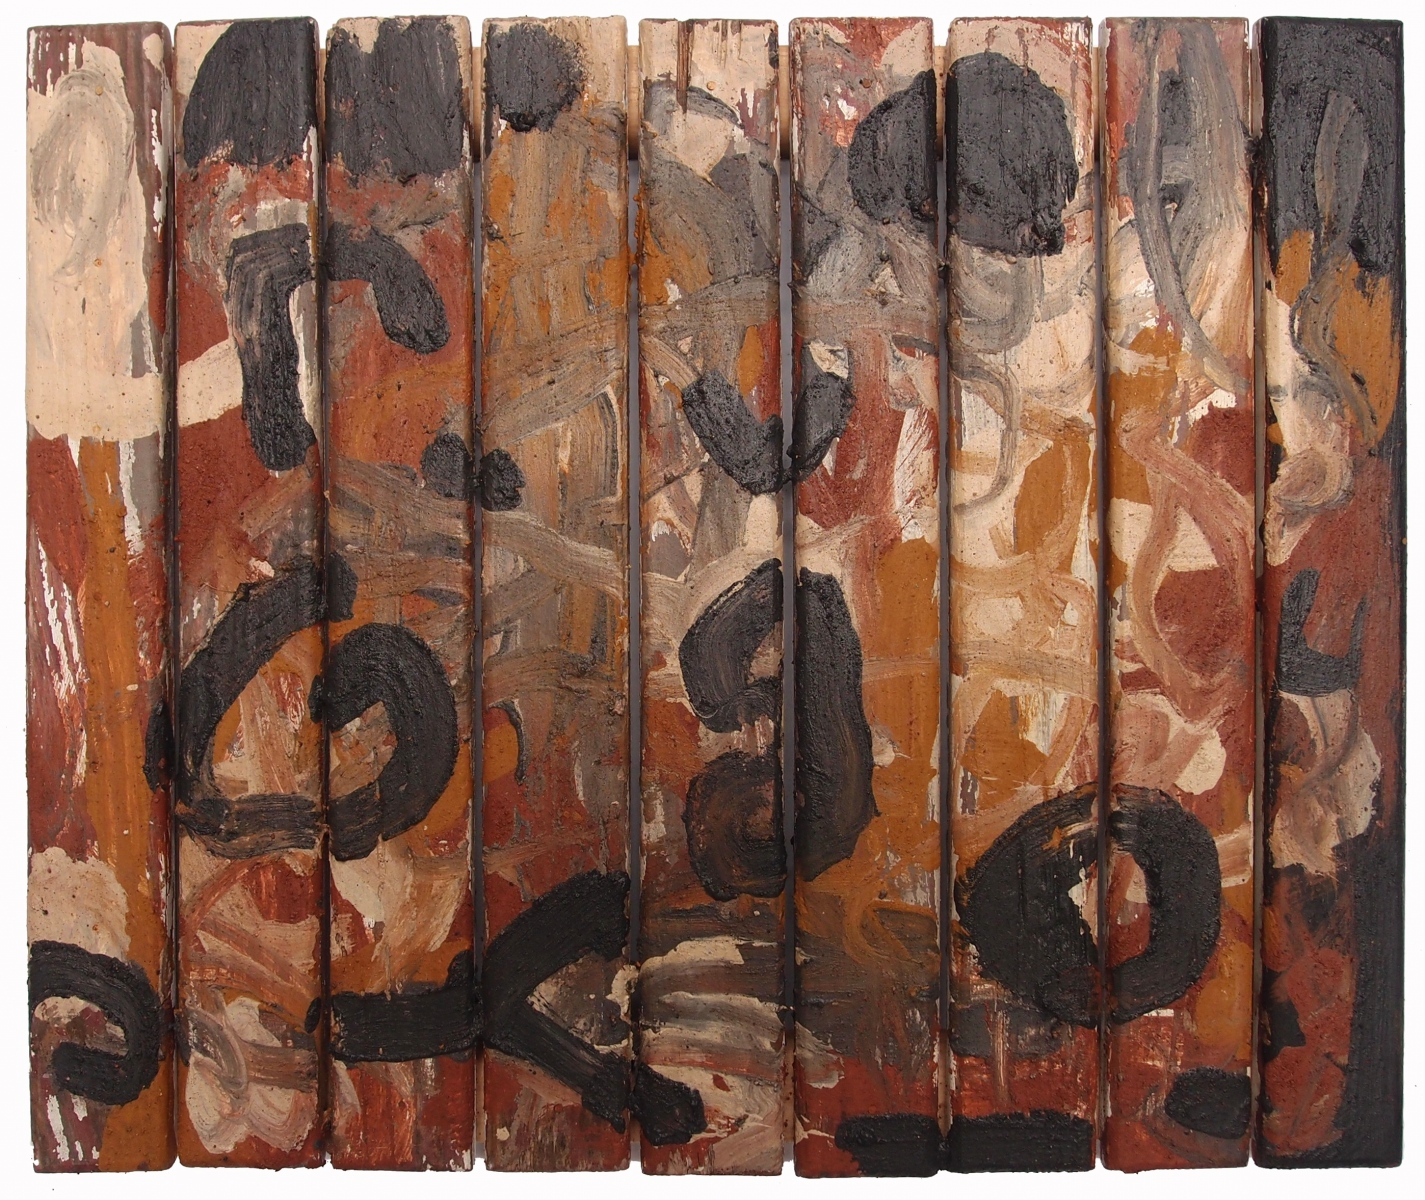 un nuovo modo di parlare/eine neue Art zu sprechen/une nouvelle façon de parler/a new way to speak (earth pigments on reclaimed wood) © p ward 2017